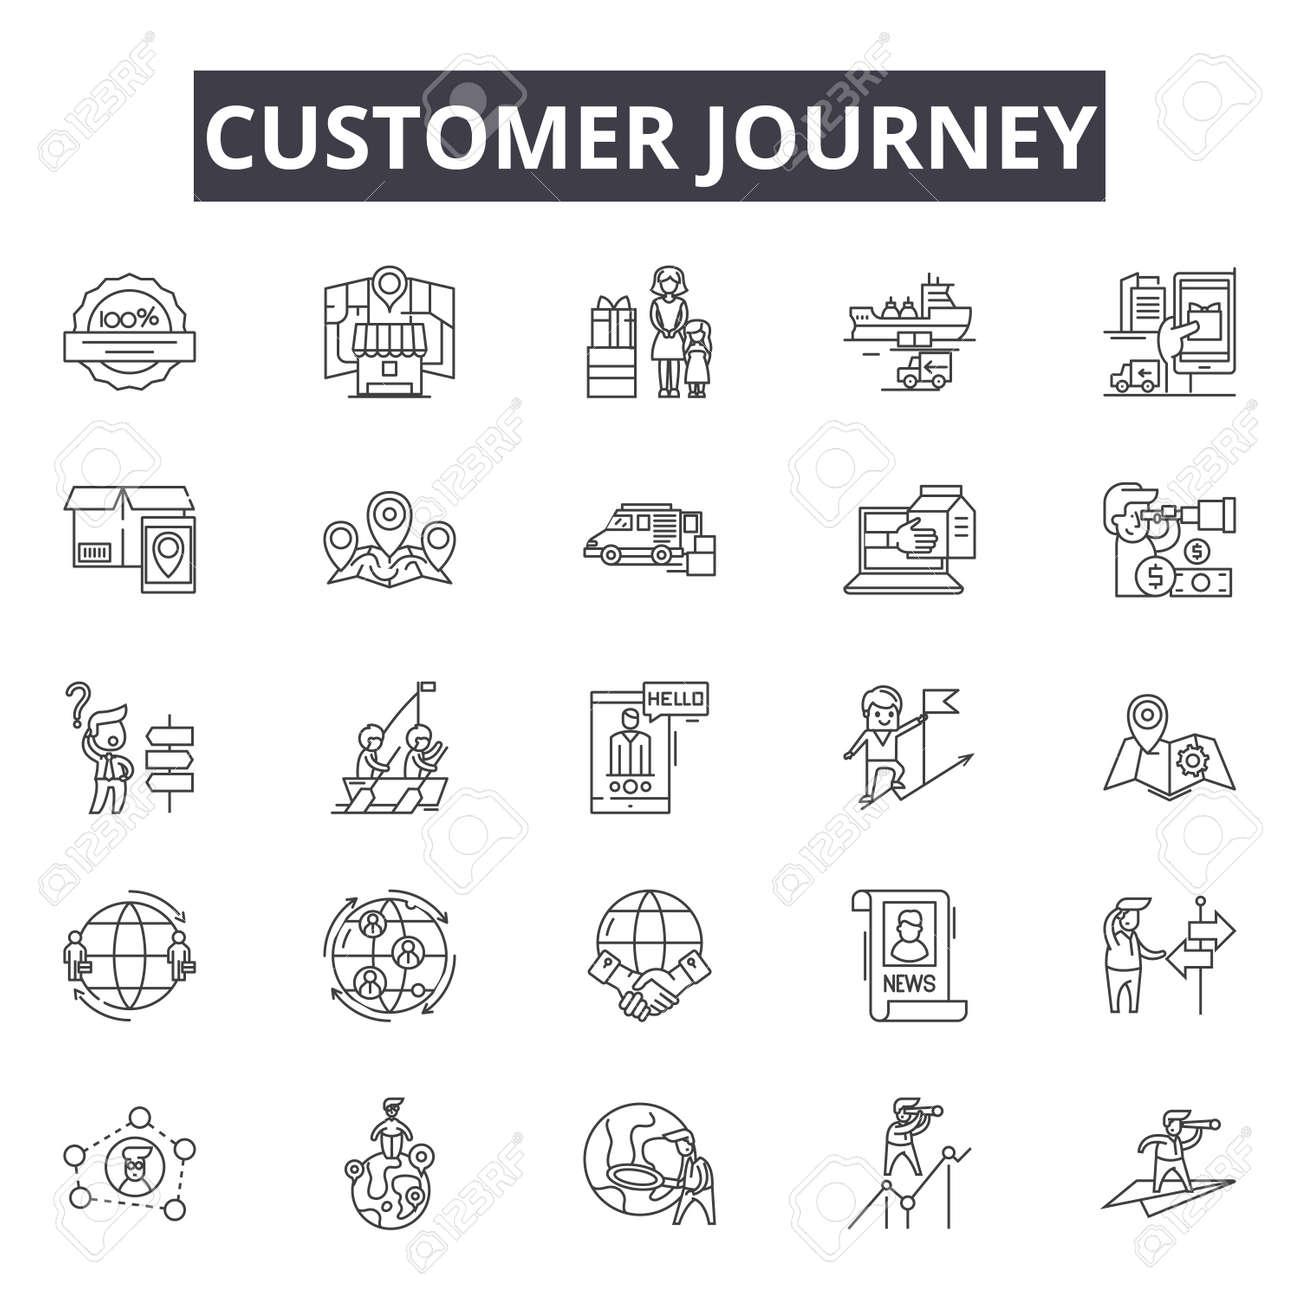 Customer journey line icons, signs set, vector. Customer journey outline concept illustration: journey,customer,business,marketing,concept,digital - 120894791